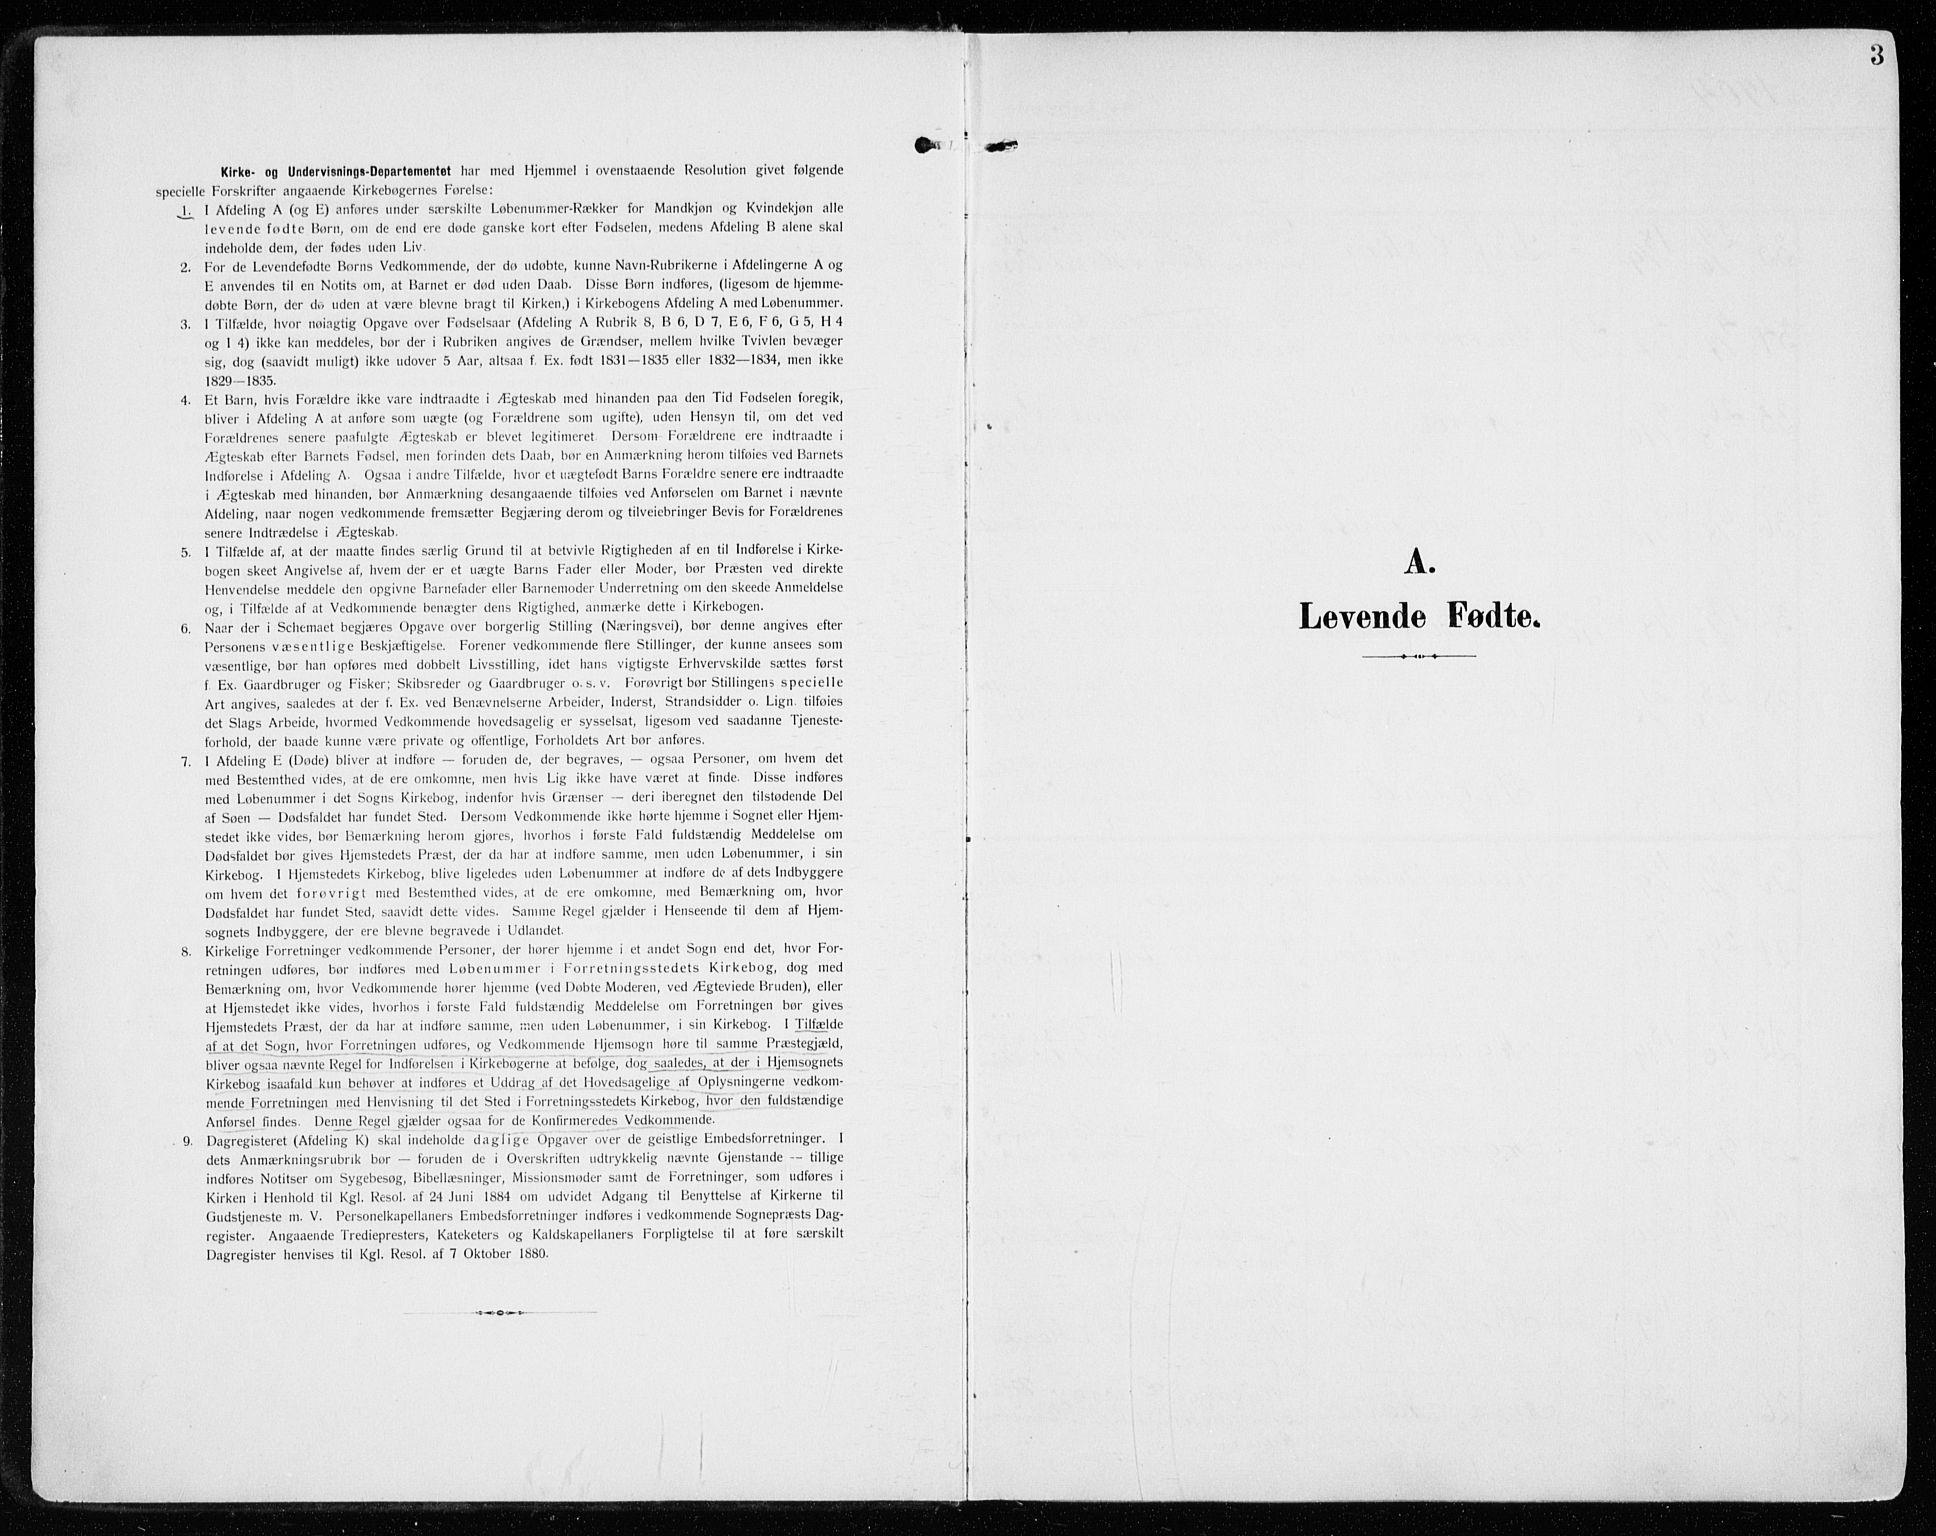 SAH, Vardal prestekontor, H/Ha/Haa/L0016: Ministerialbok nr. 16, 1904-1916, s. 3